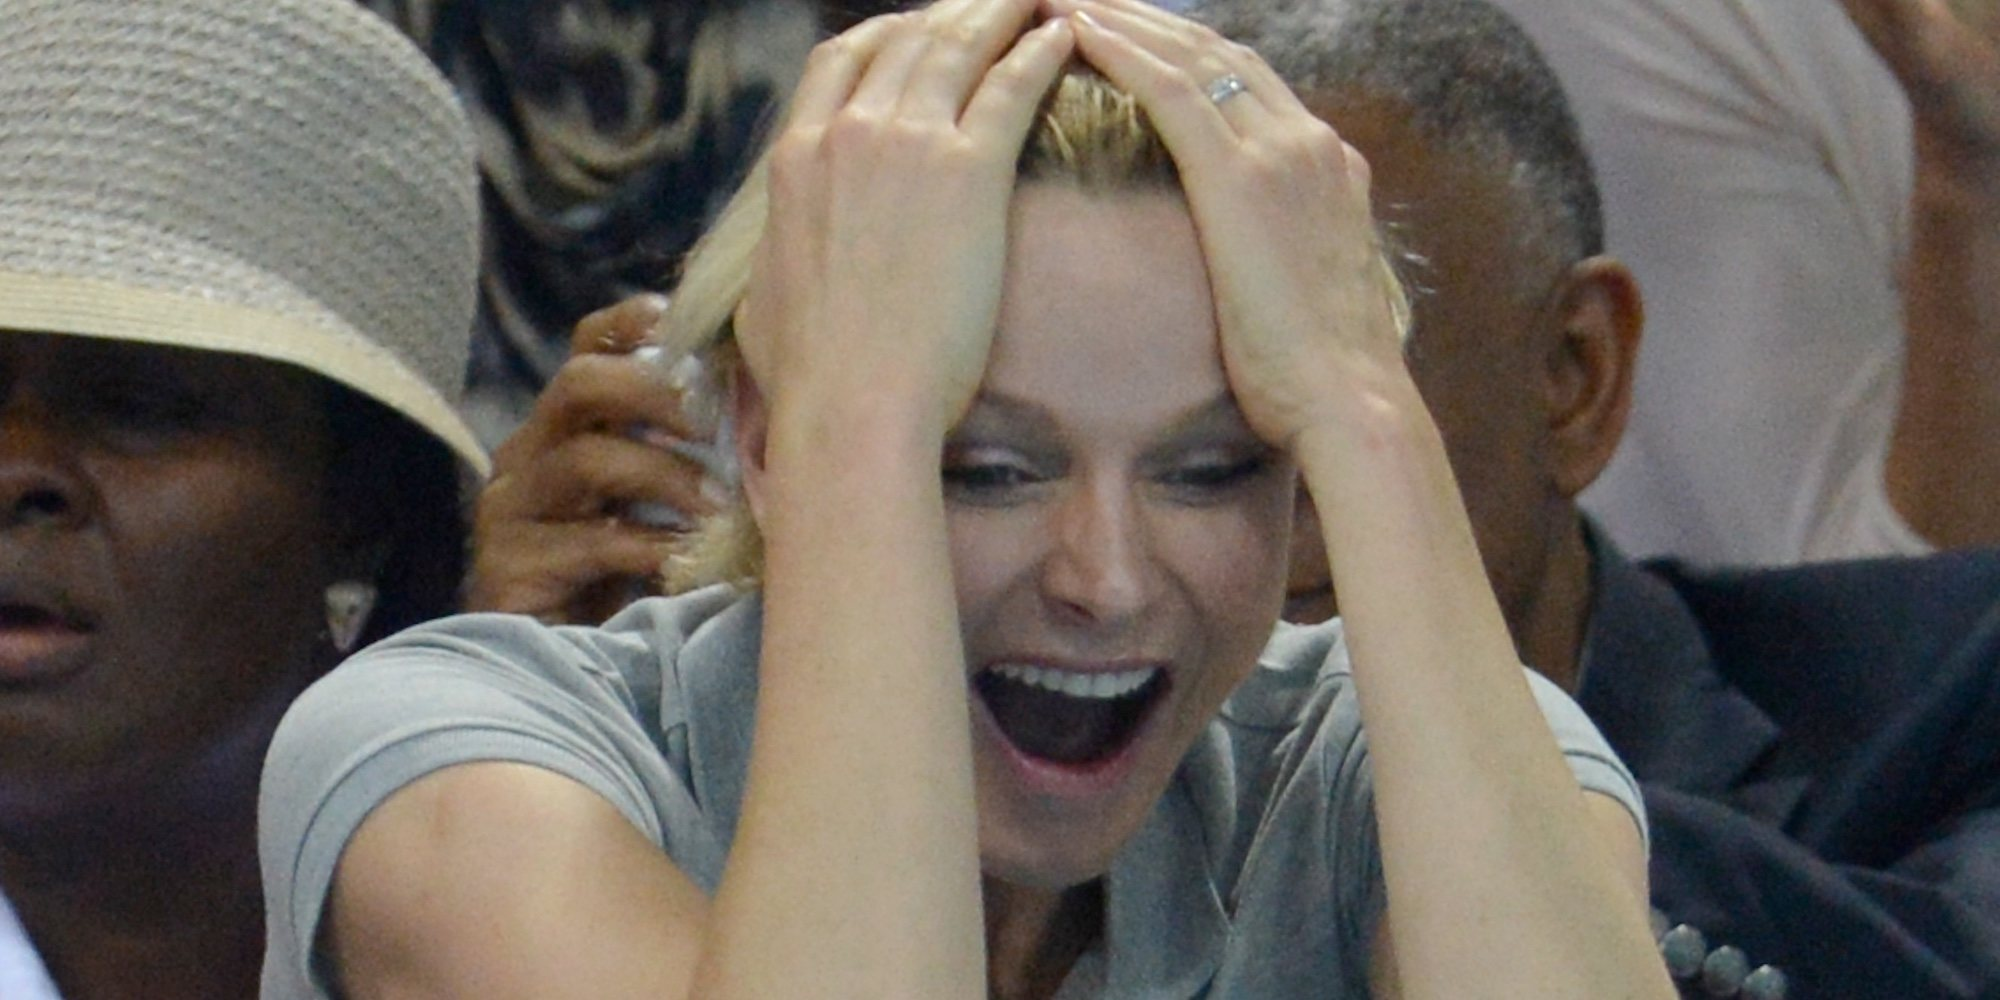 Charlene de Mónaco, desatada en un bar monegasco con su hermano Gareth Wittstock